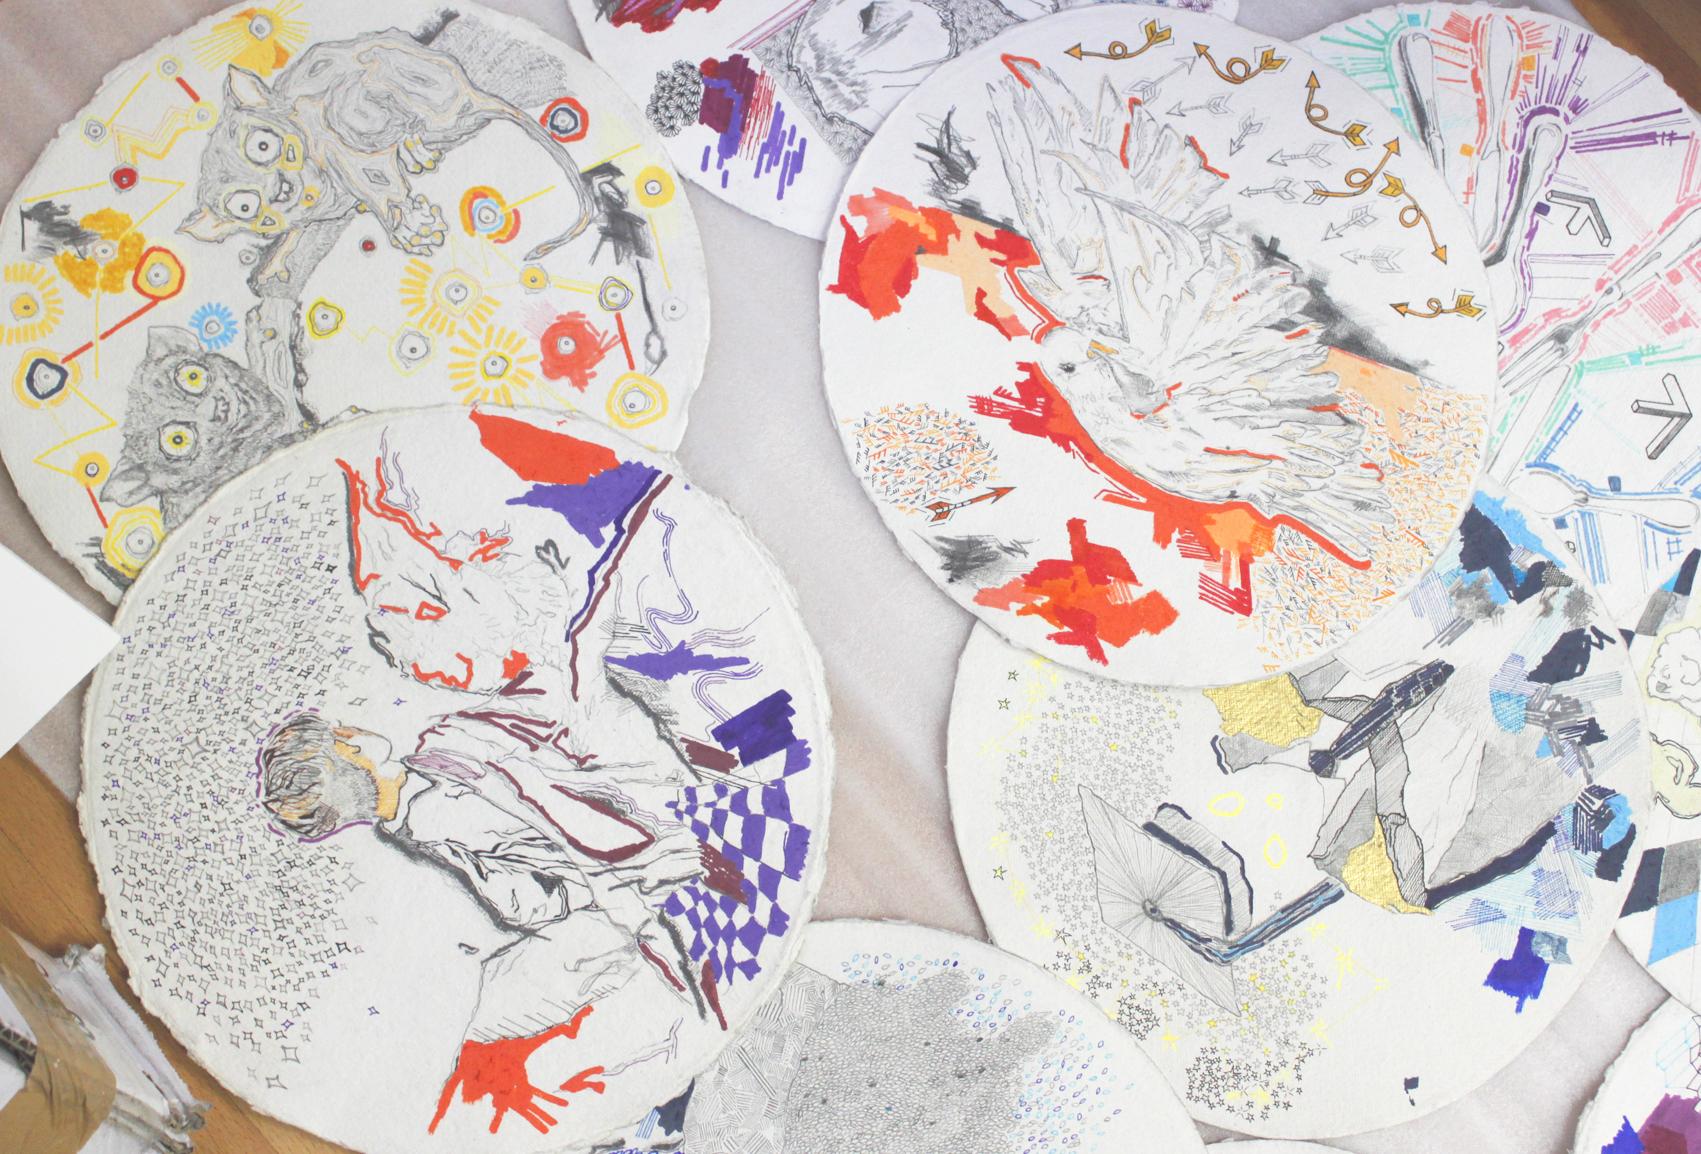 Australian artist studio visit - Kieth Yap, The Corner Store Gallery, Orange NSW, photograph by Madeline Young